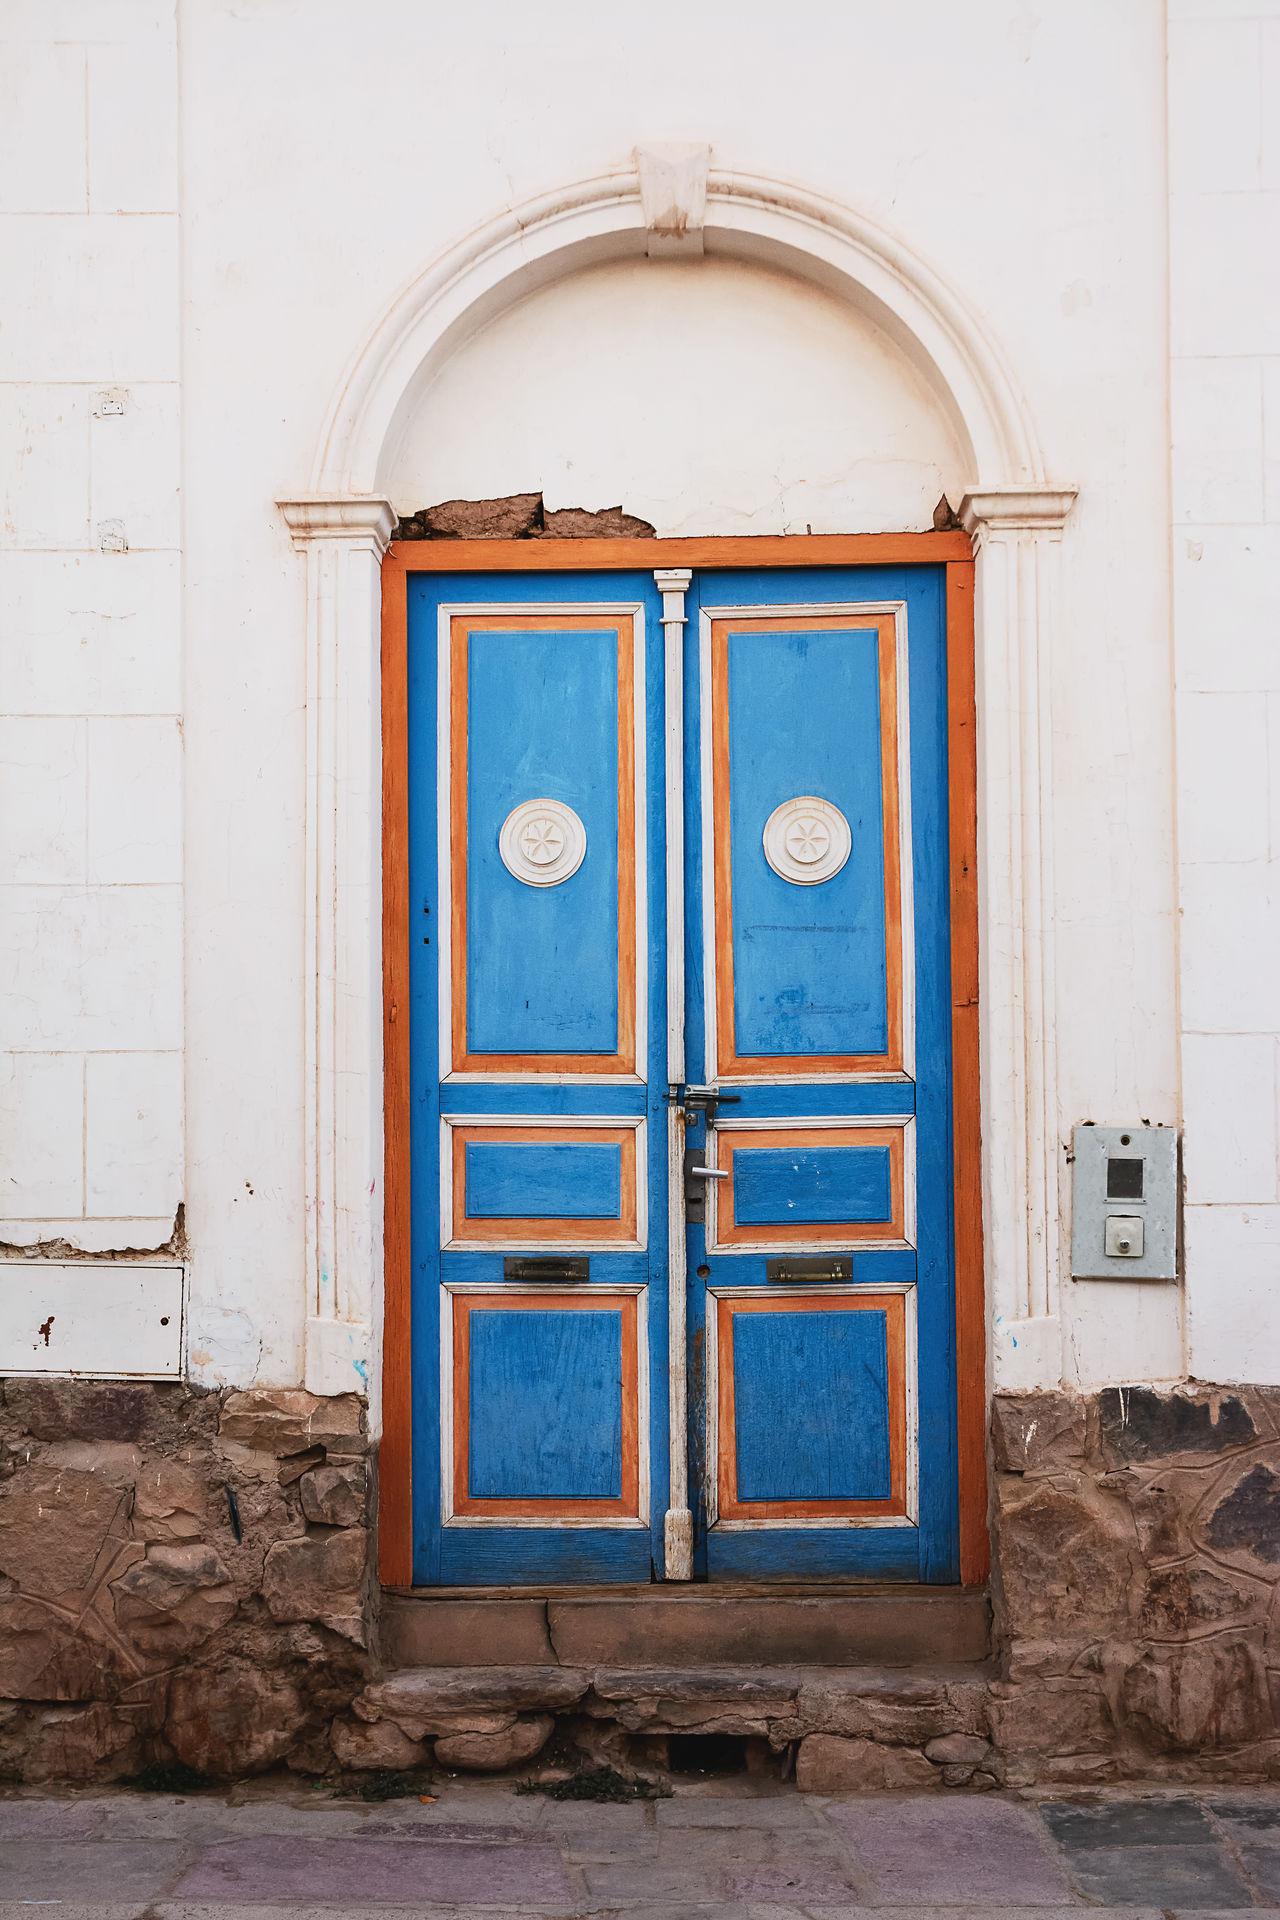 Old colored door in Tilcara of Jujuy(Argentina) America Argentina Blue Building City Door Jujuy Old Street Tilcara Tilcara, Jujuy.